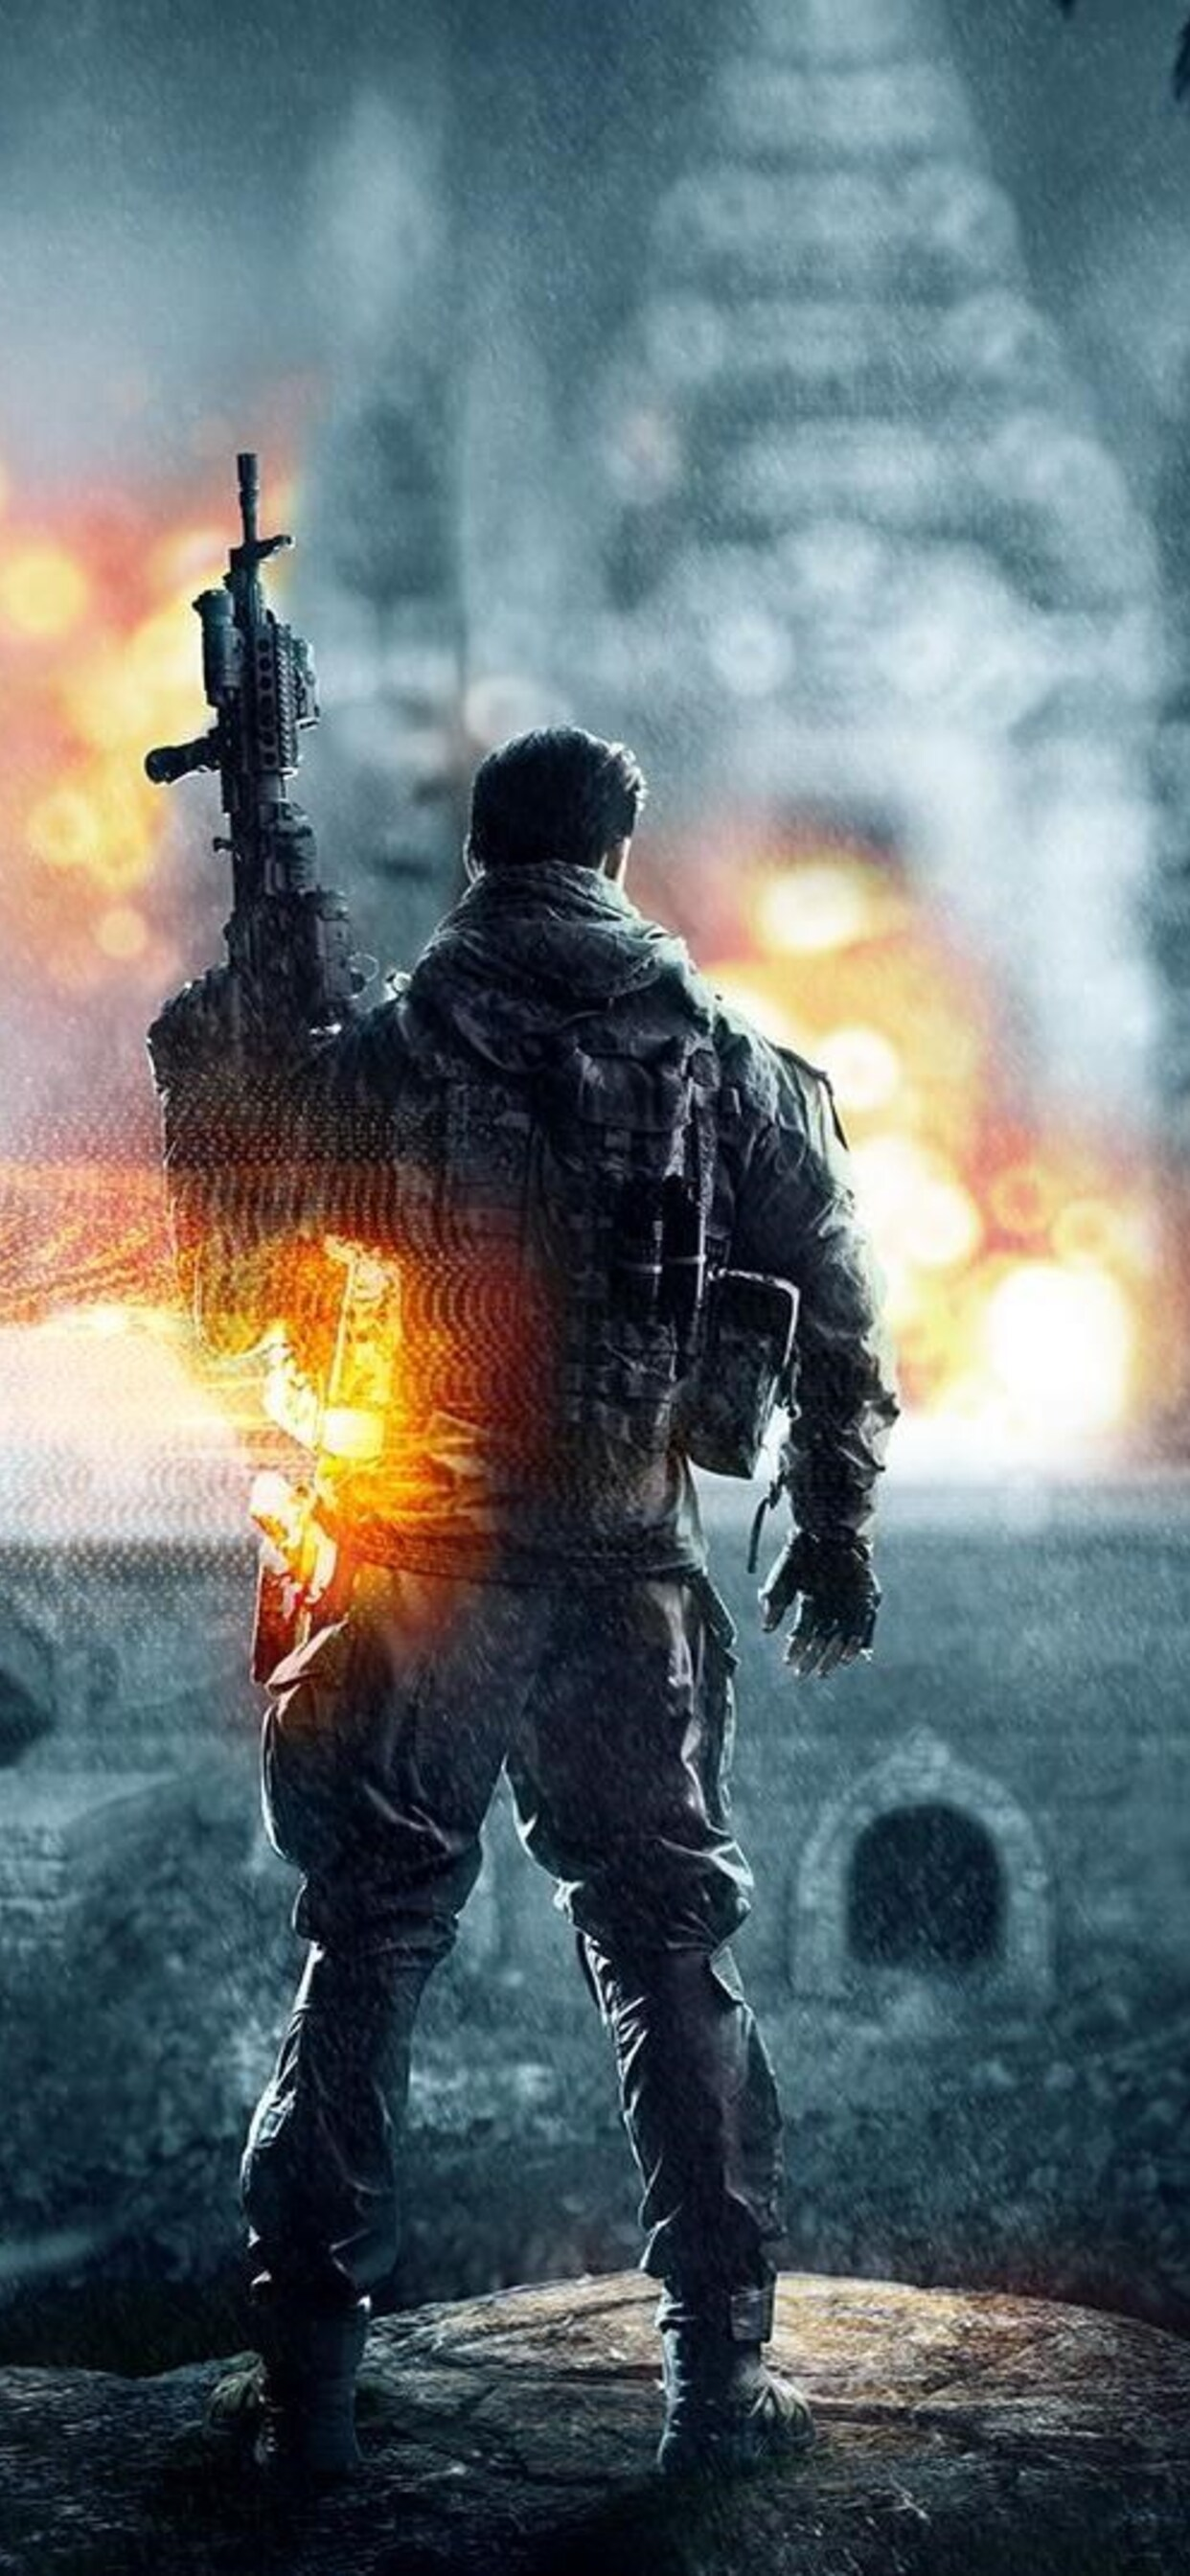 battlefield-4-game-mission.jpg